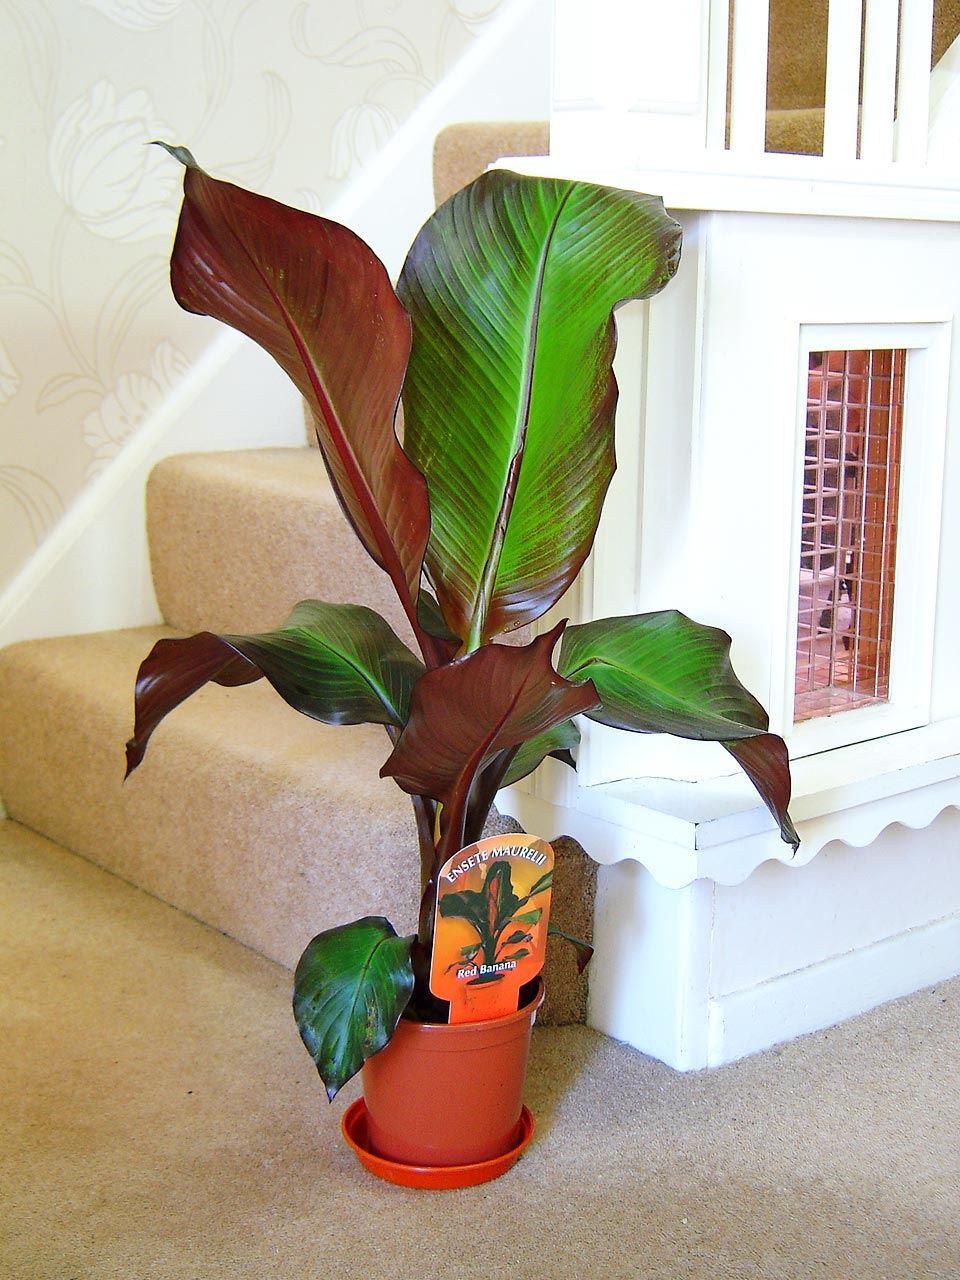 musa dwarf cavendish blood banana plant evergreen indoor